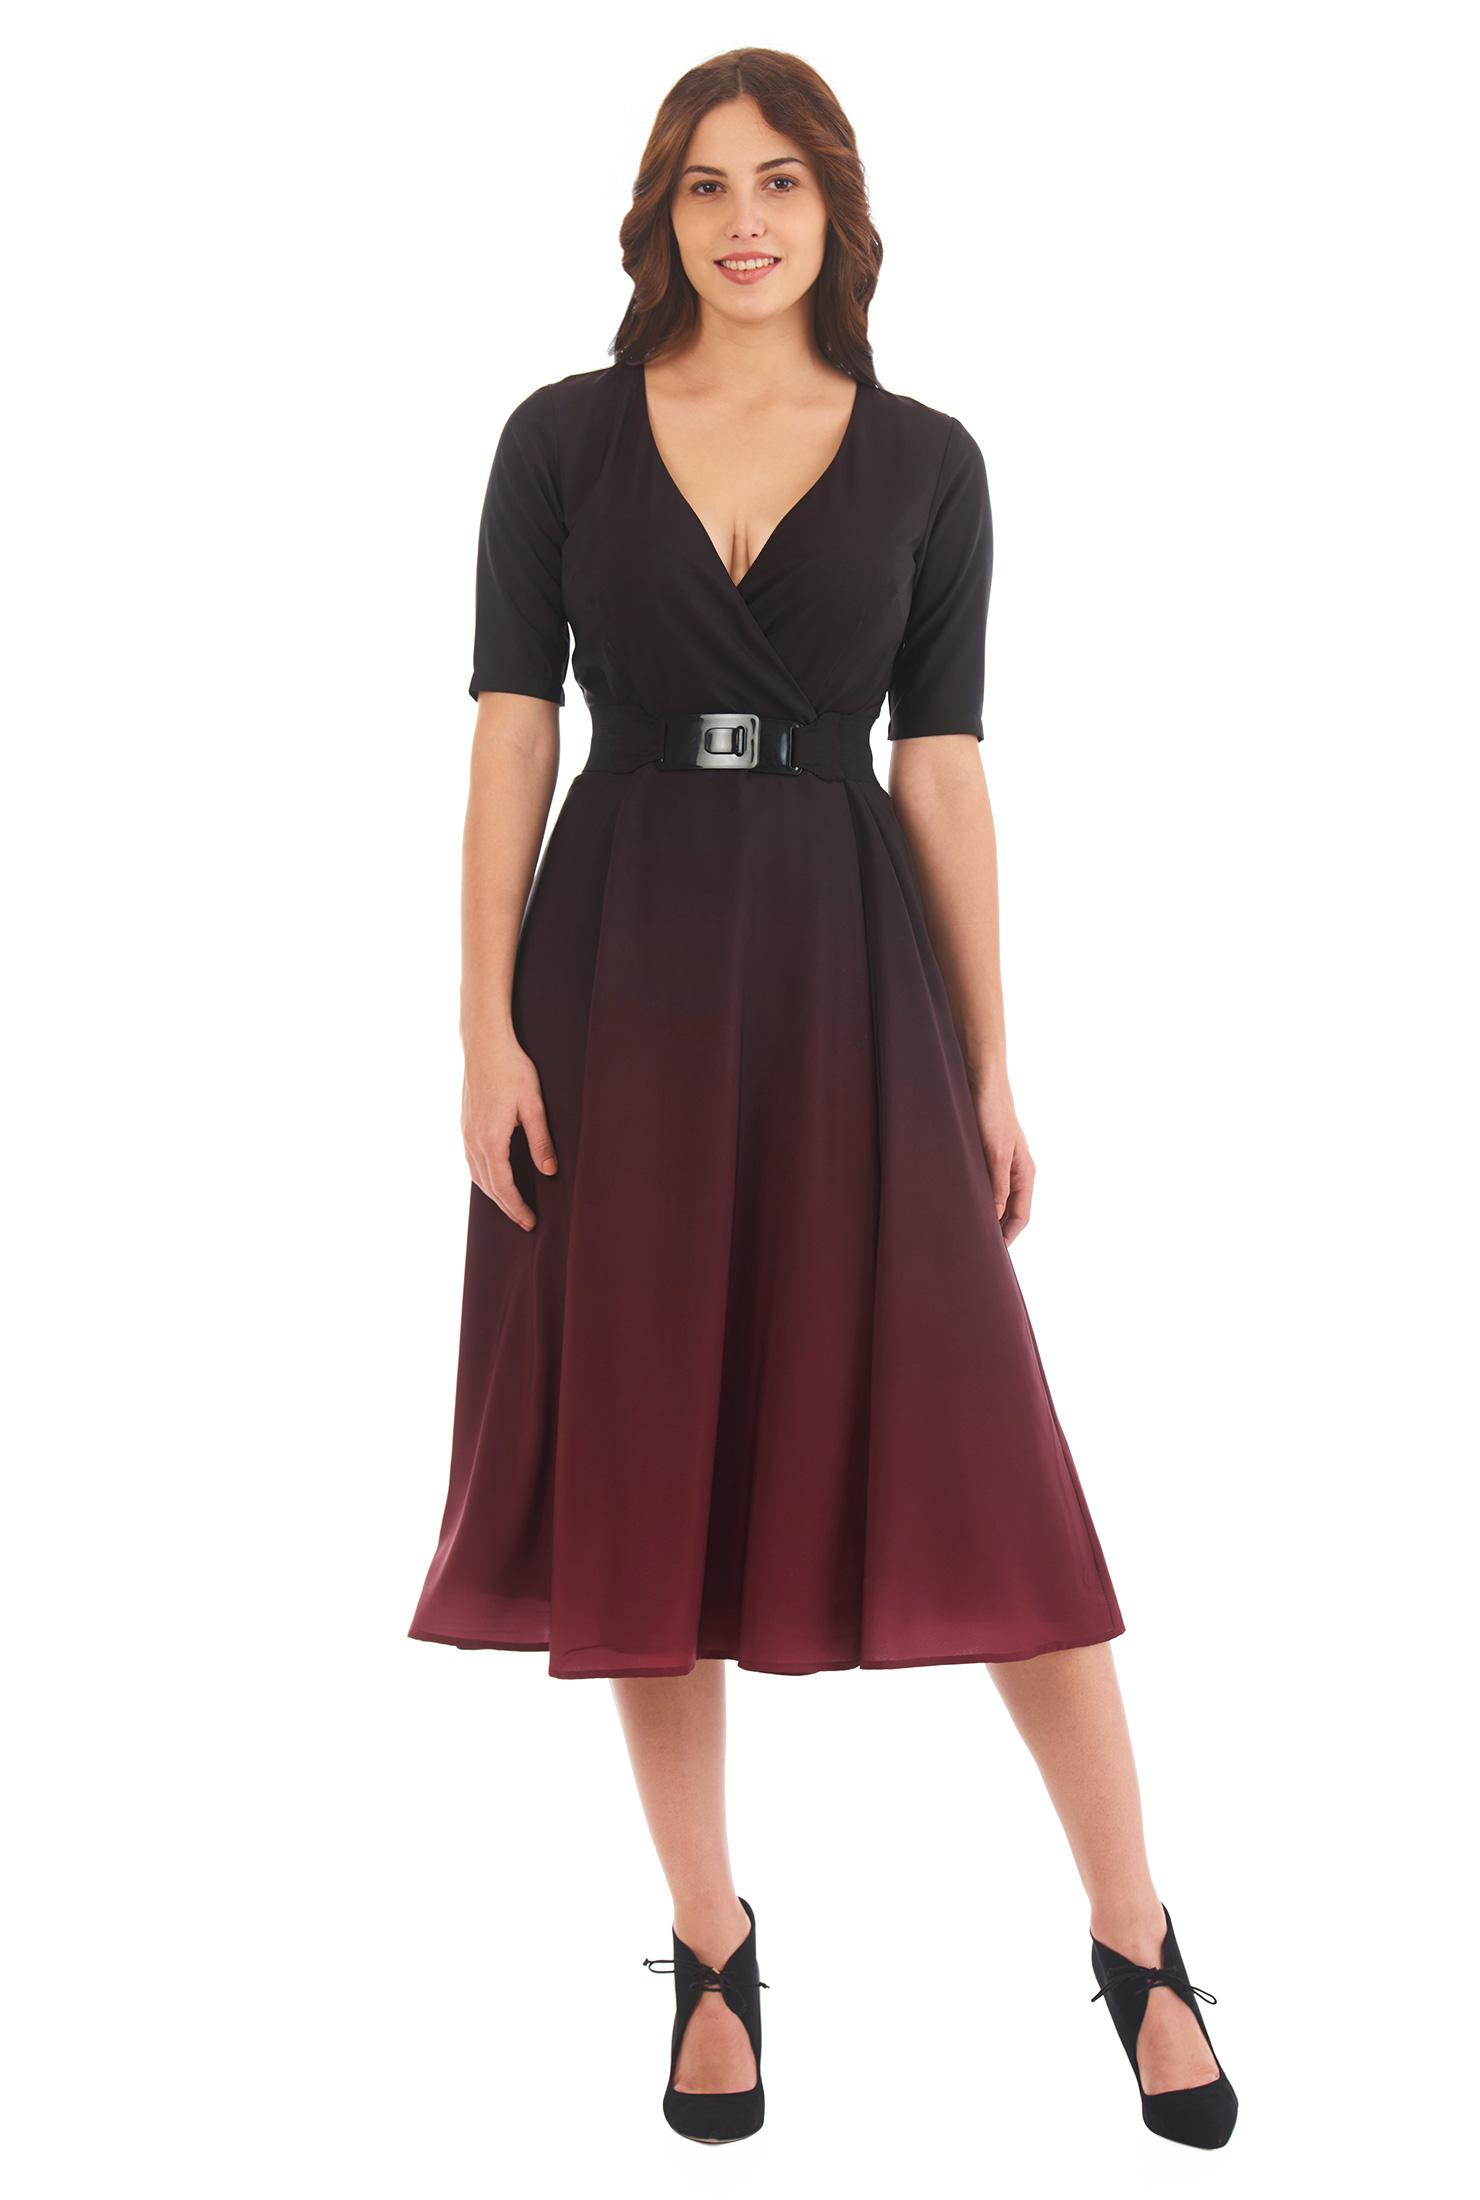 Women s Fashion Clothing 0-36W and Custom 8e38bba38